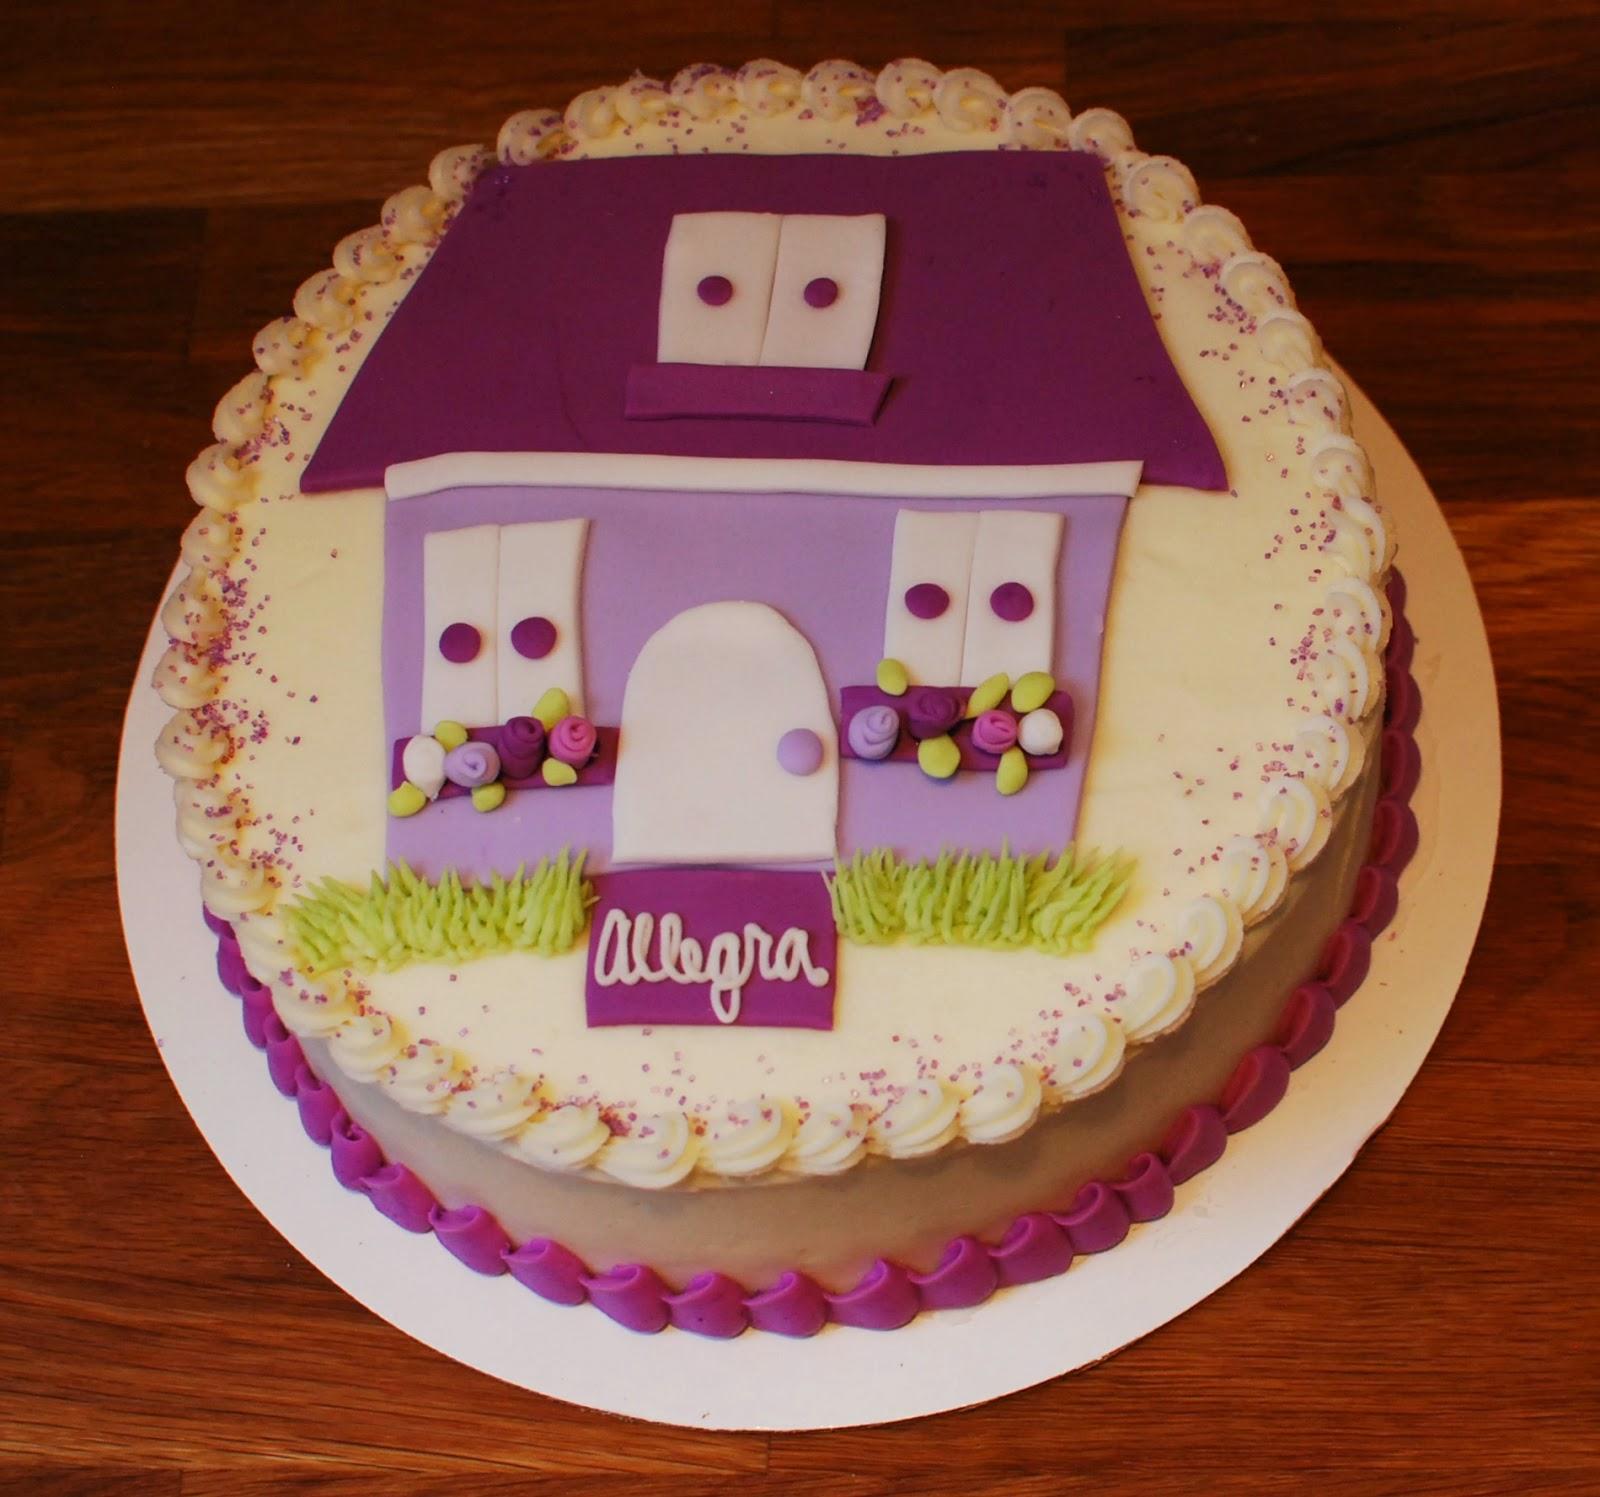 Snacky French Princess Aurora And A Dollhouse Cake